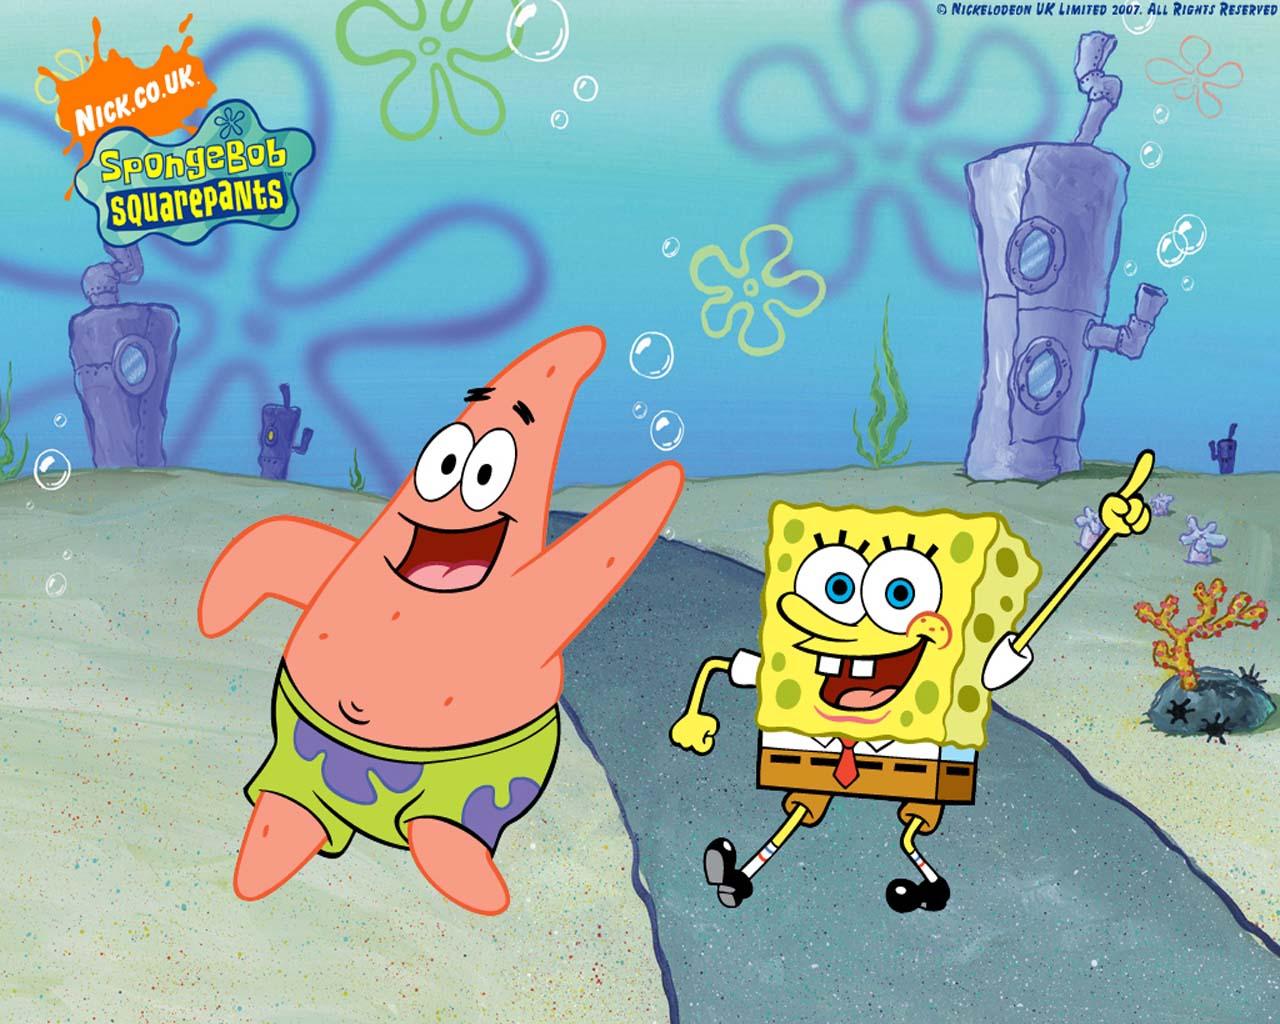 Dancing with Patrick Spongebob Wallpaper | Cute Spongebob ...